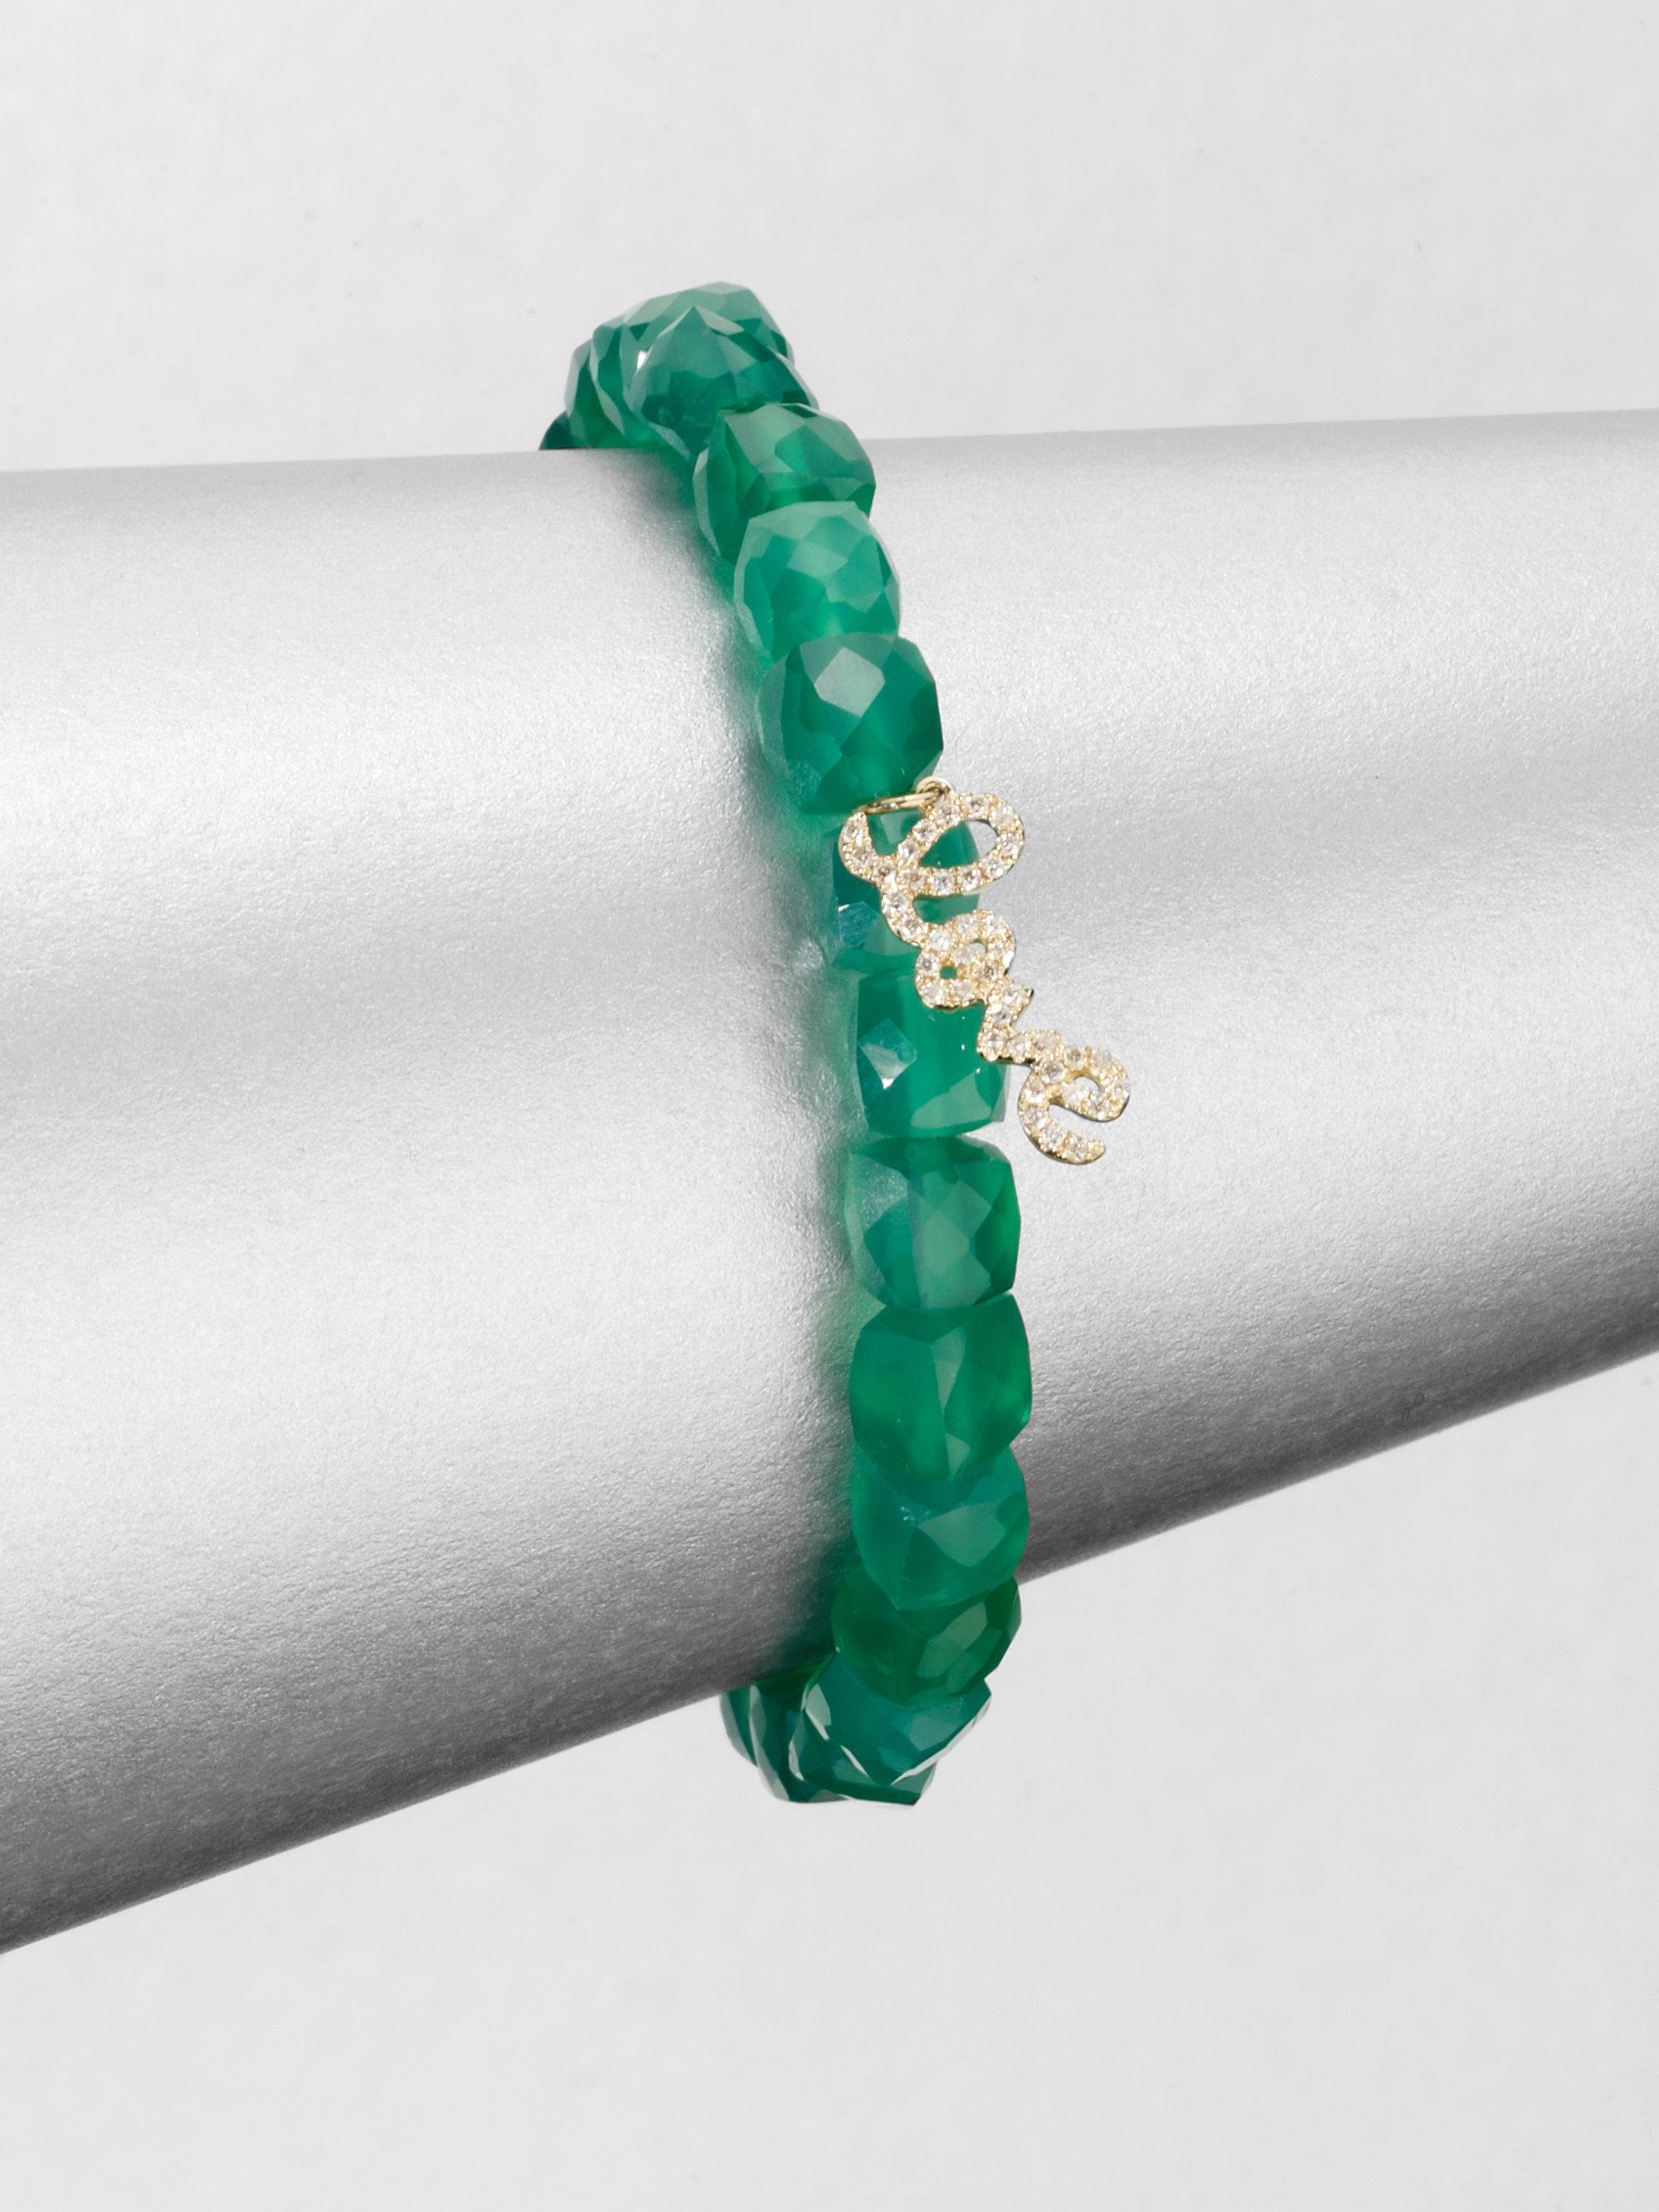 Sydney Evan 8mm Green Silverite Cube Beaded Bracelet w/14K Gold Diamond Rondelle KytxDj